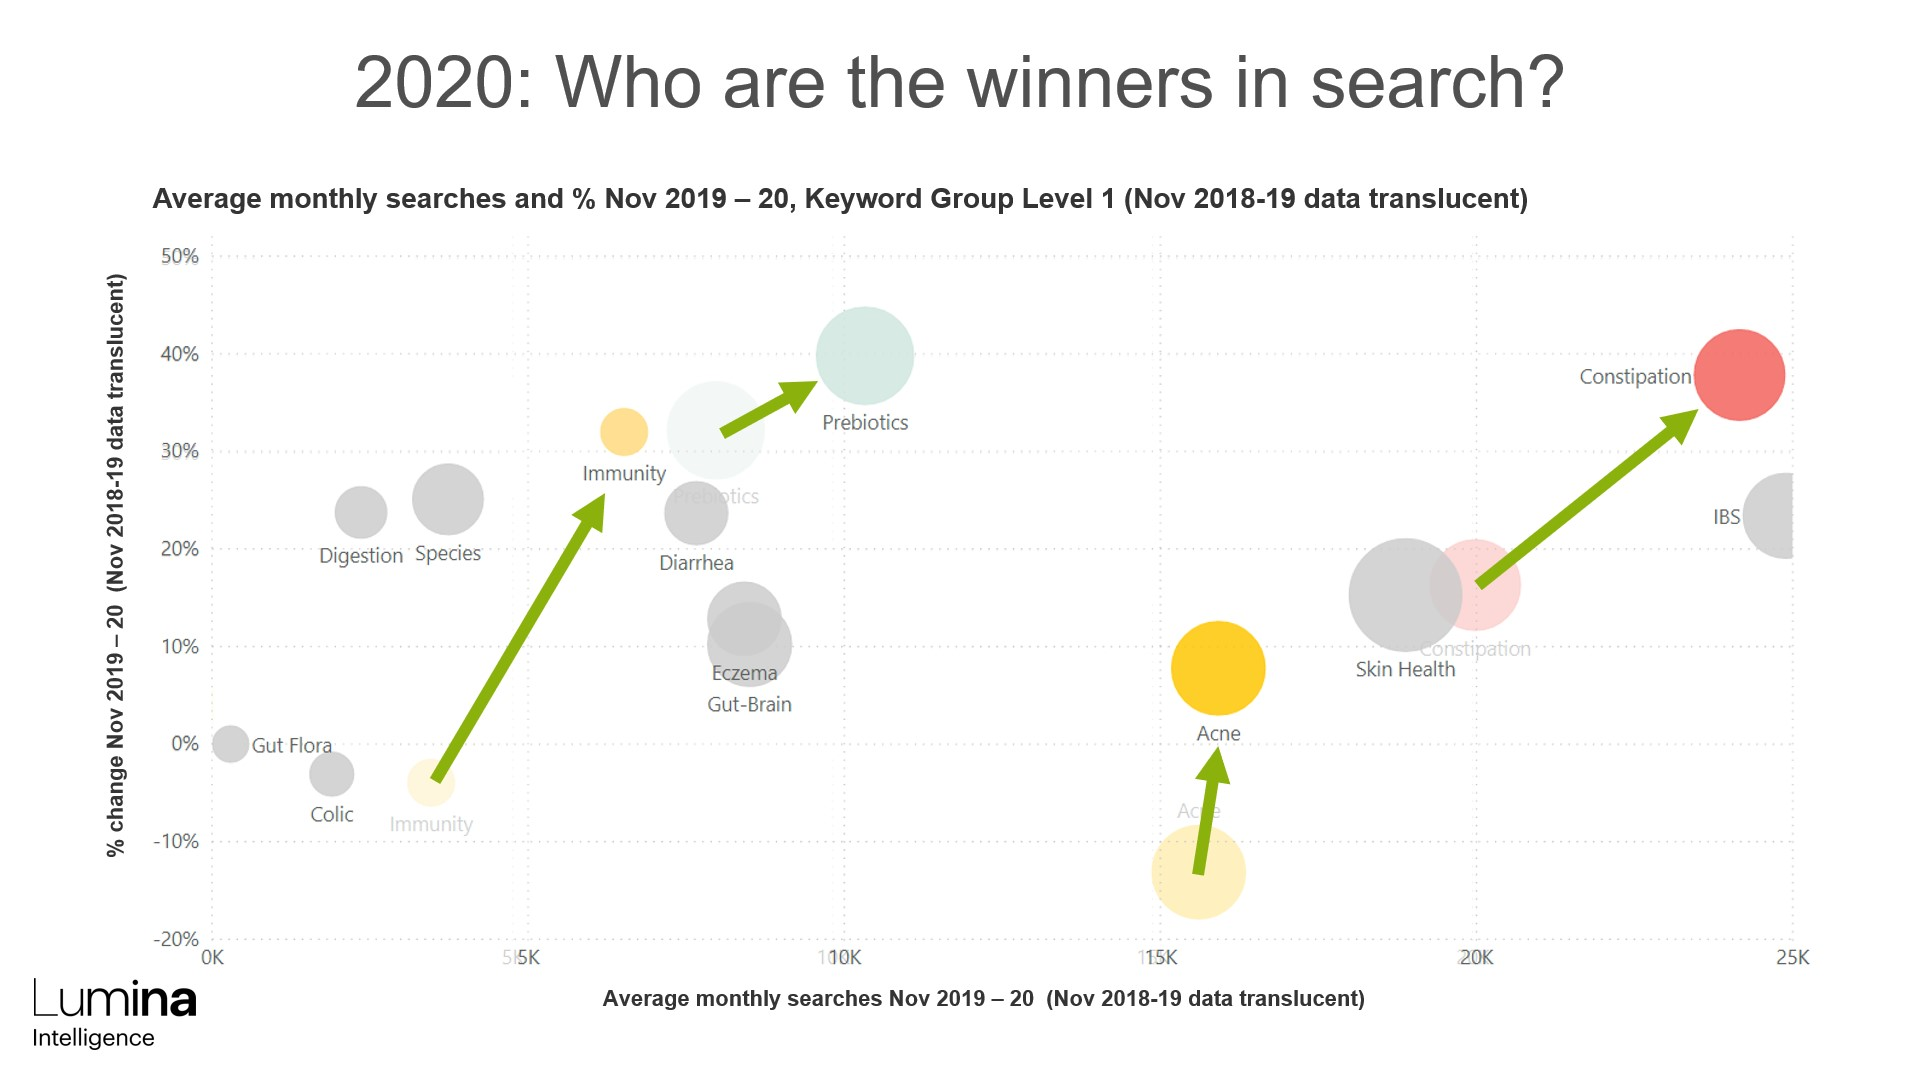 Winners in search 2020 probiotics